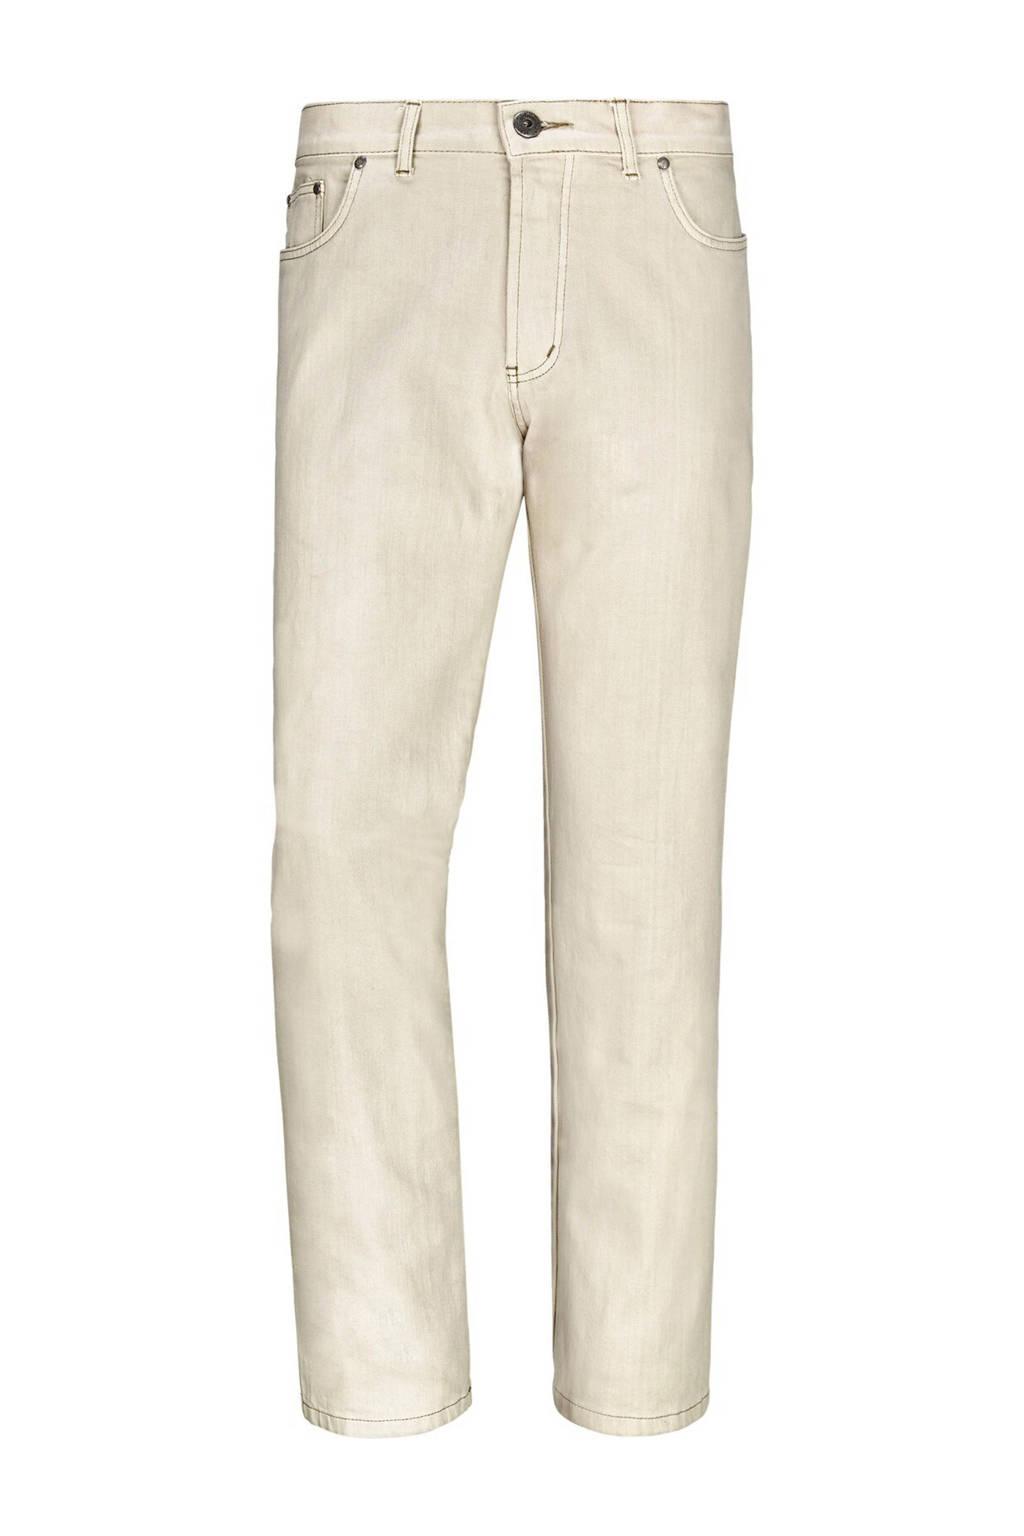 Jan Vanderstorm regular fit broek Plus Size GUNNAR ecru, Ecru